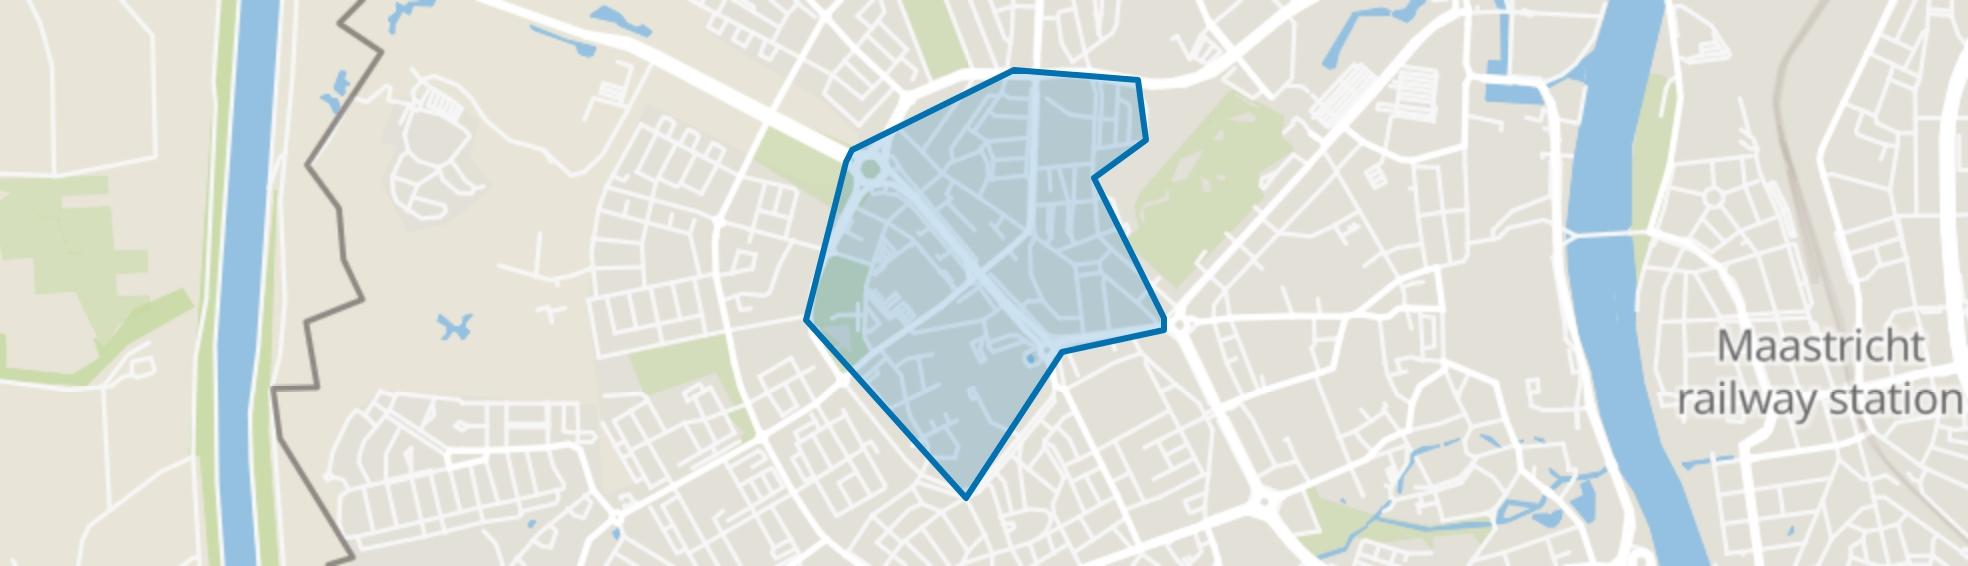 Brusselsepoort, Maastricht map